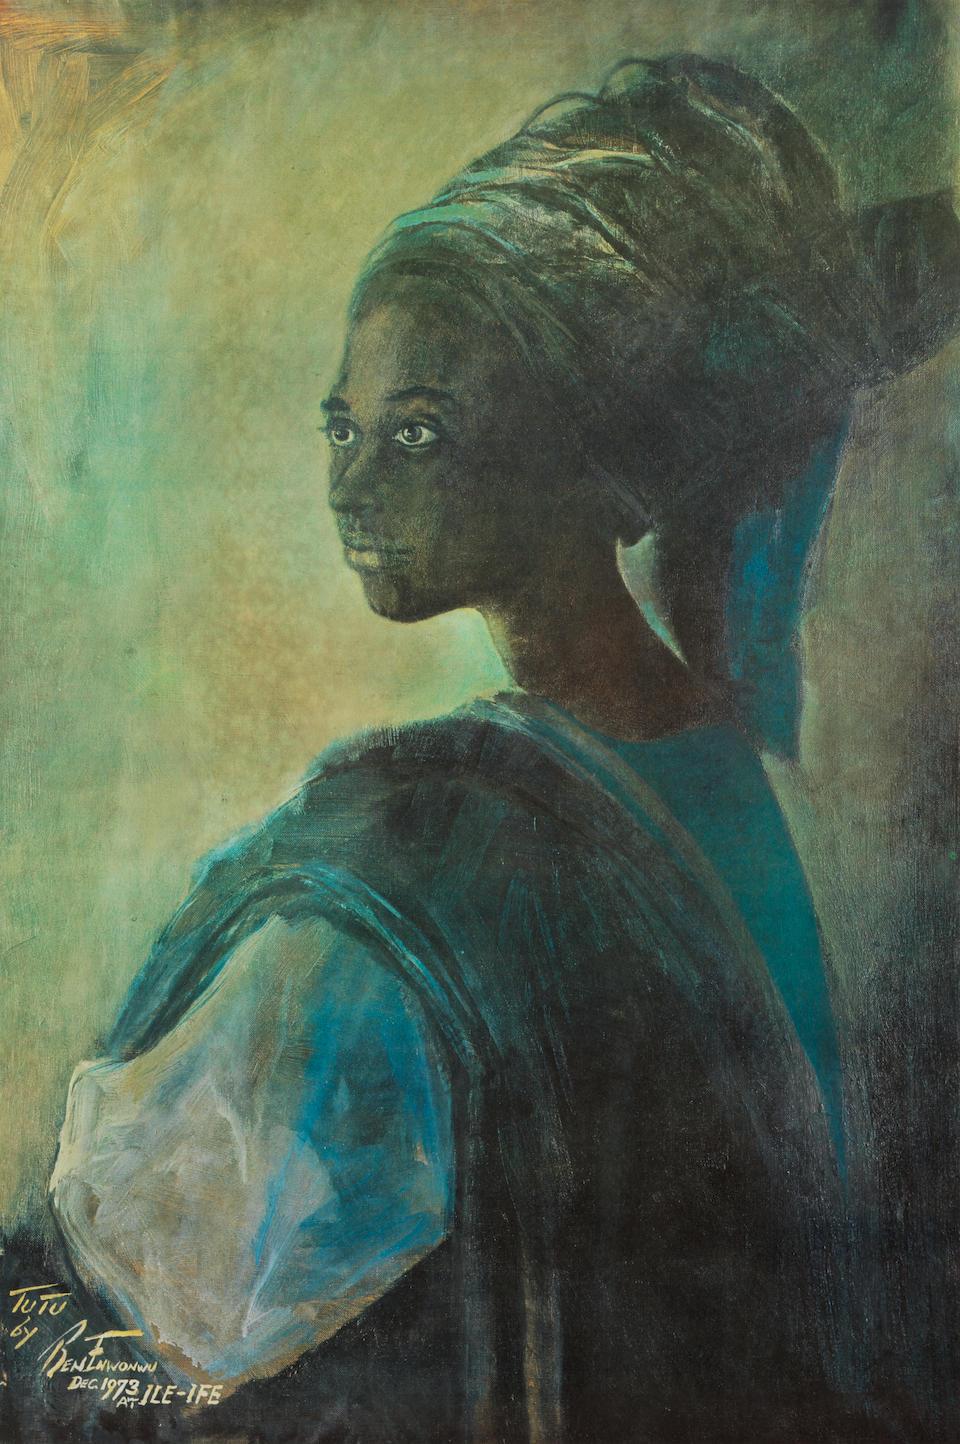 Benedict Chukwukadibia Enwonwu M.B.E (Nigerian, 1917-1994) Tutu